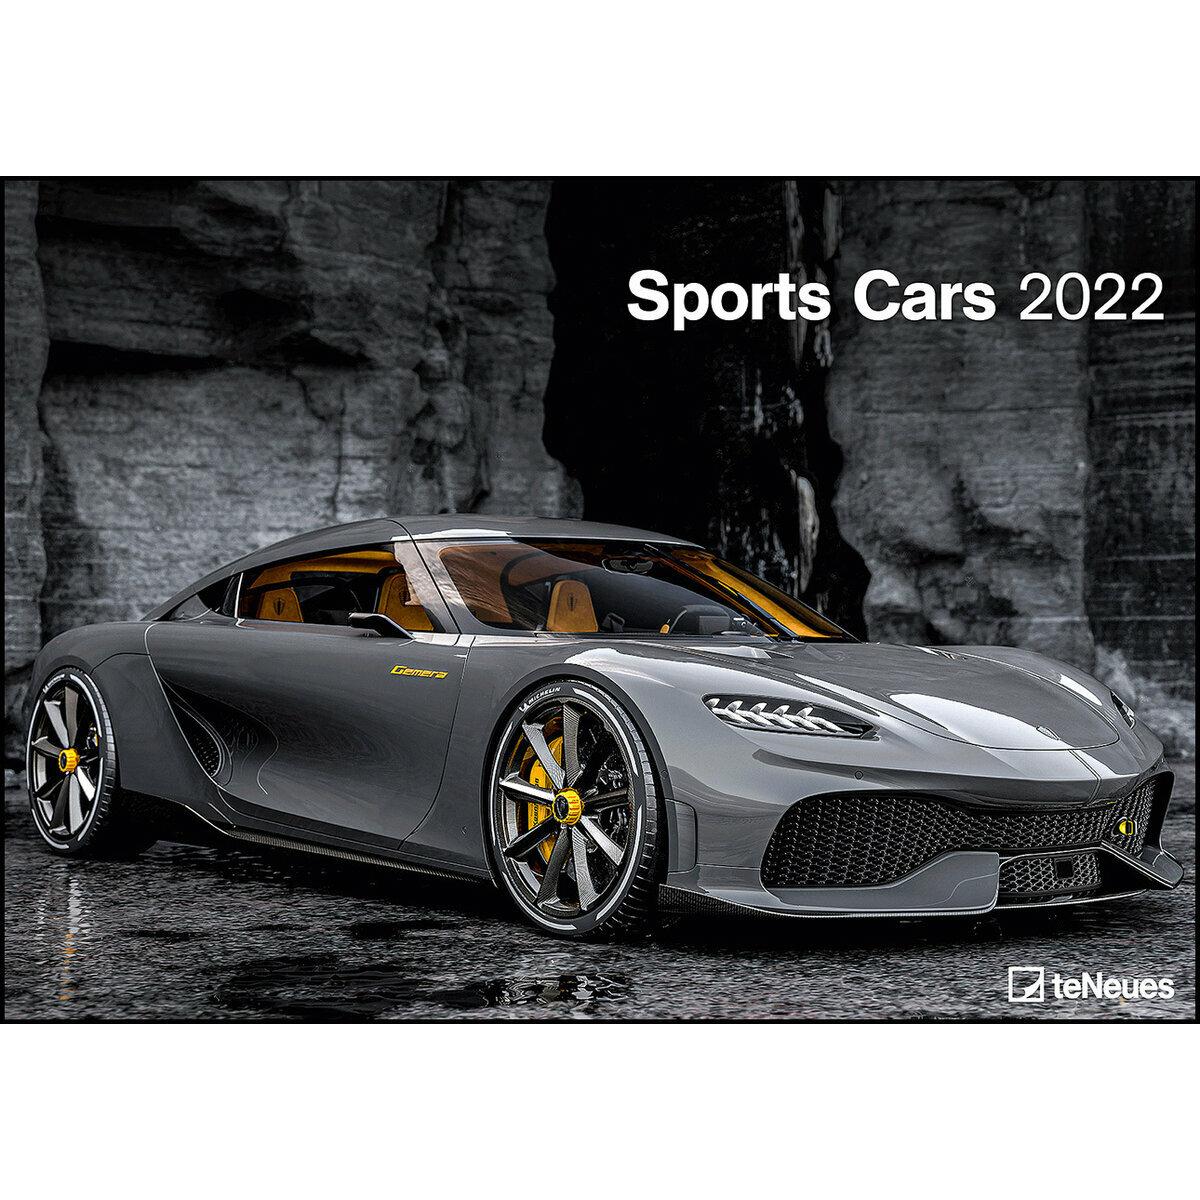 Calendrier Des Sportifs 2022 Maxi Calendrier 2022 Voiture sportive